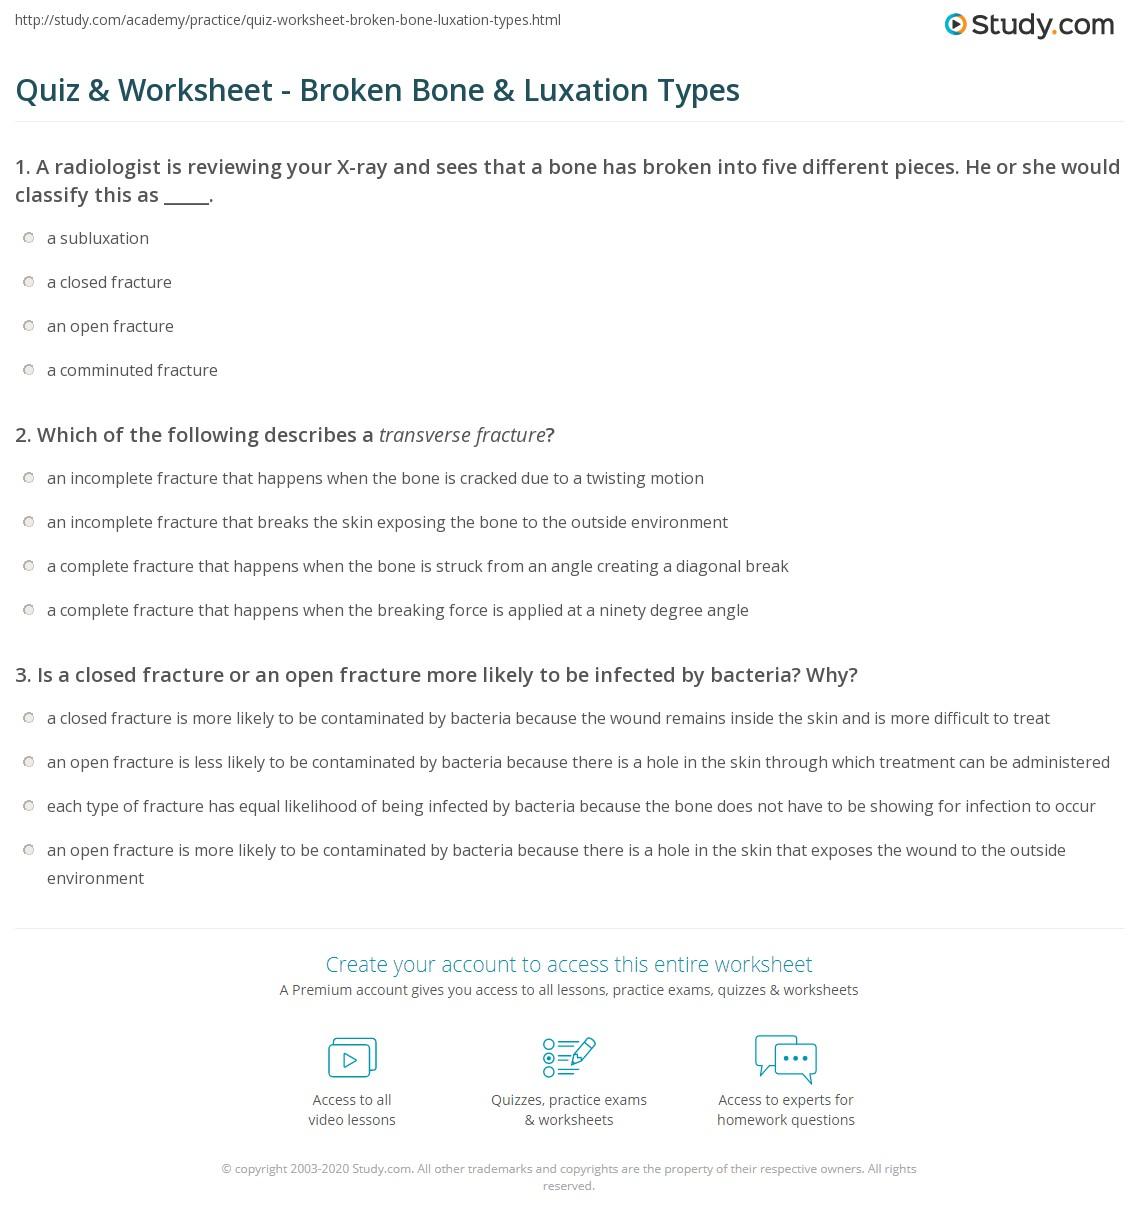 quiz worksheet broken bone luxation types. Black Bedroom Furniture Sets. Home Design Ideas